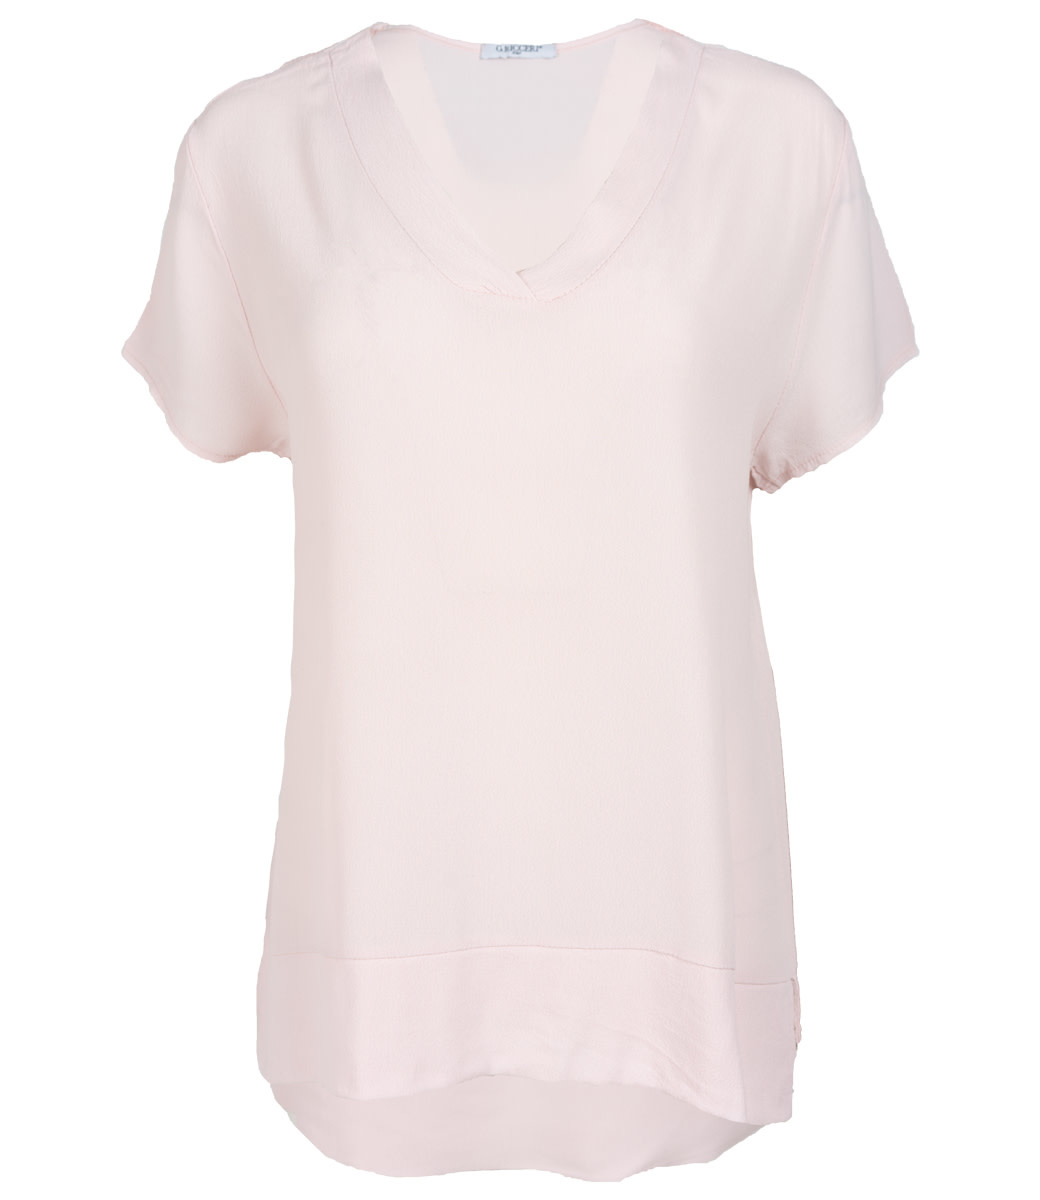 Gemma Ricceri Shirt roze v hals Macy